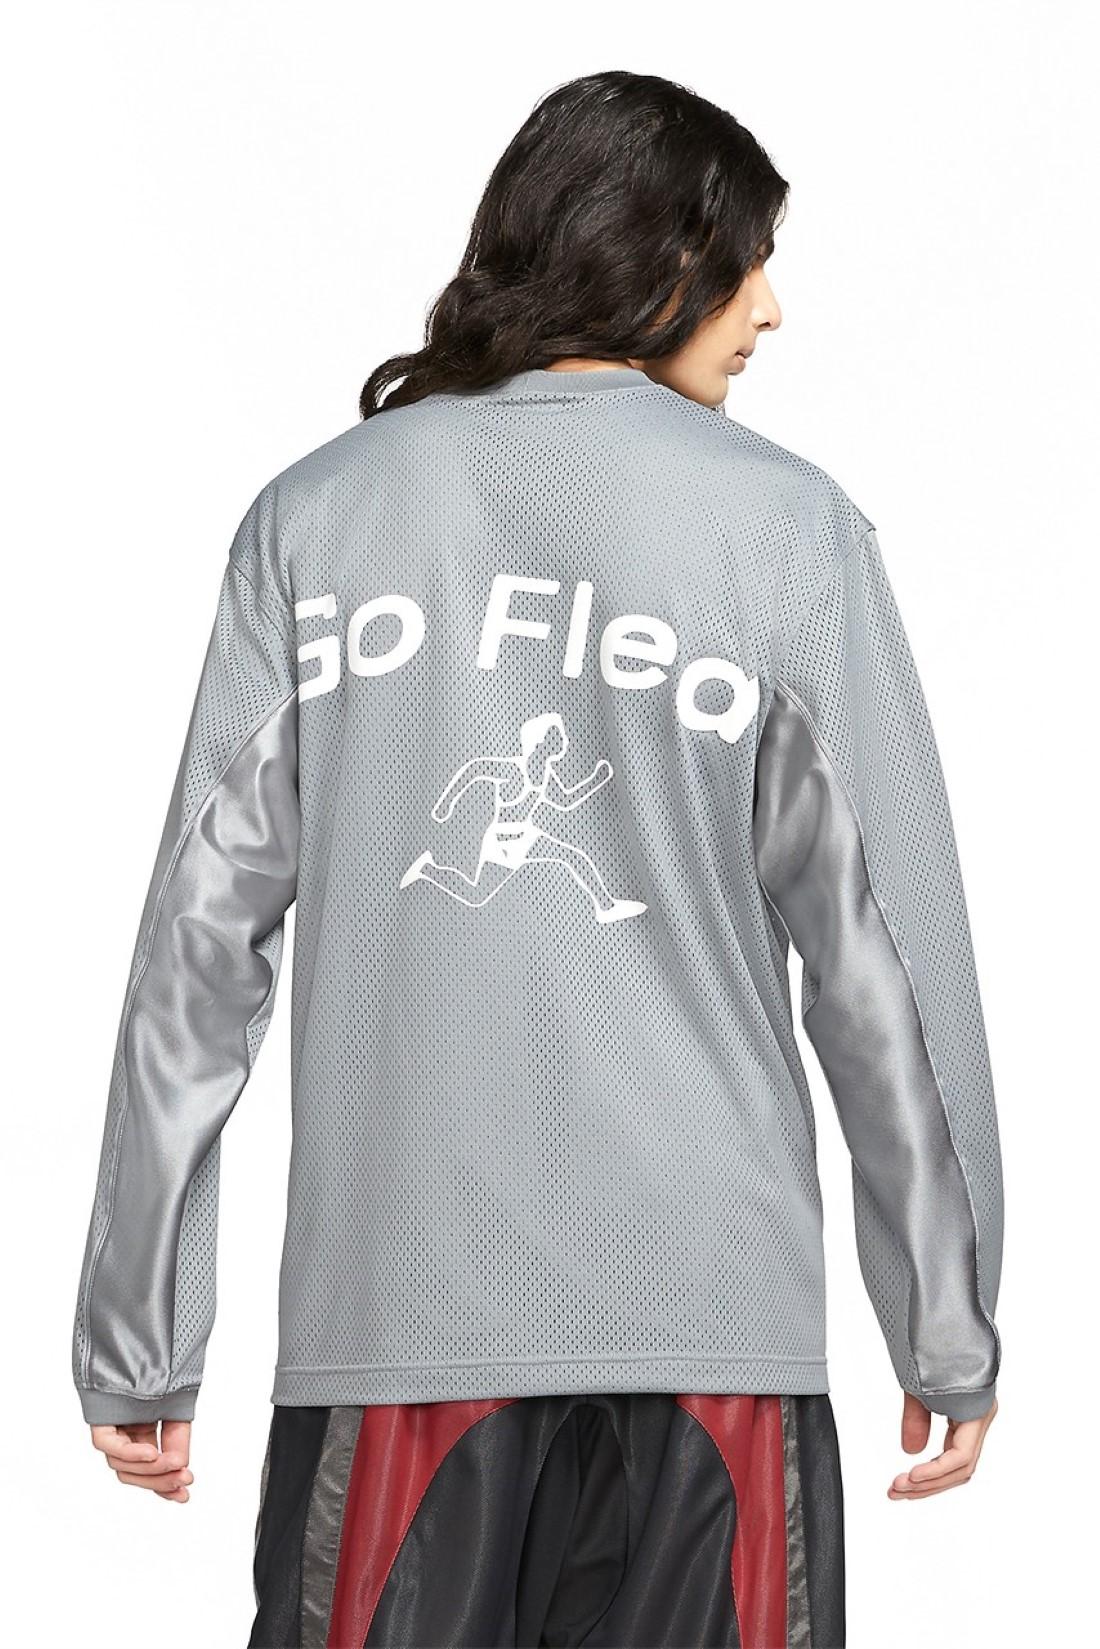 Cactus Plant Flea Market x Nike - Collection Go Flea